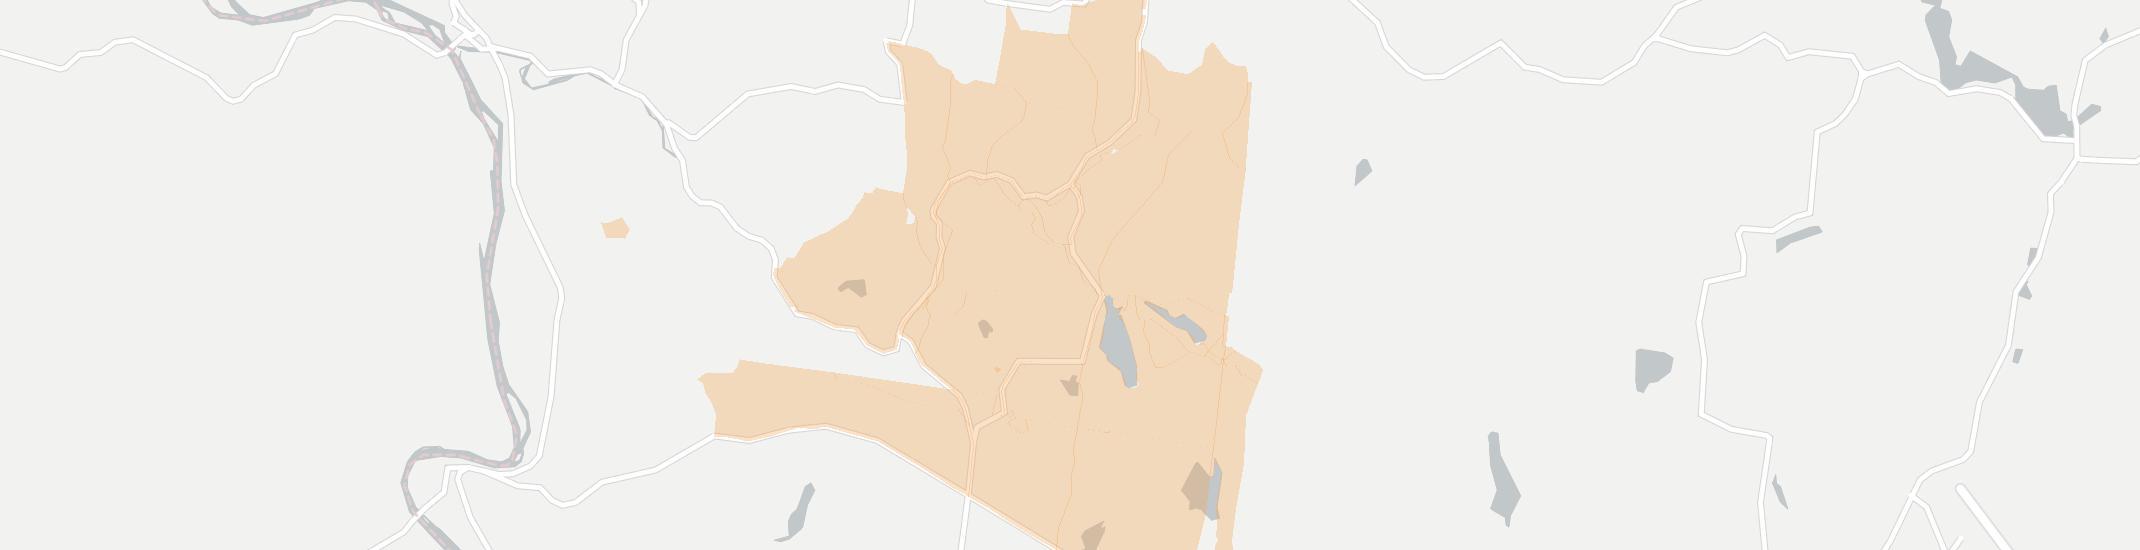 Kenoza Lake Internet Competition Map. Click for interactive map.